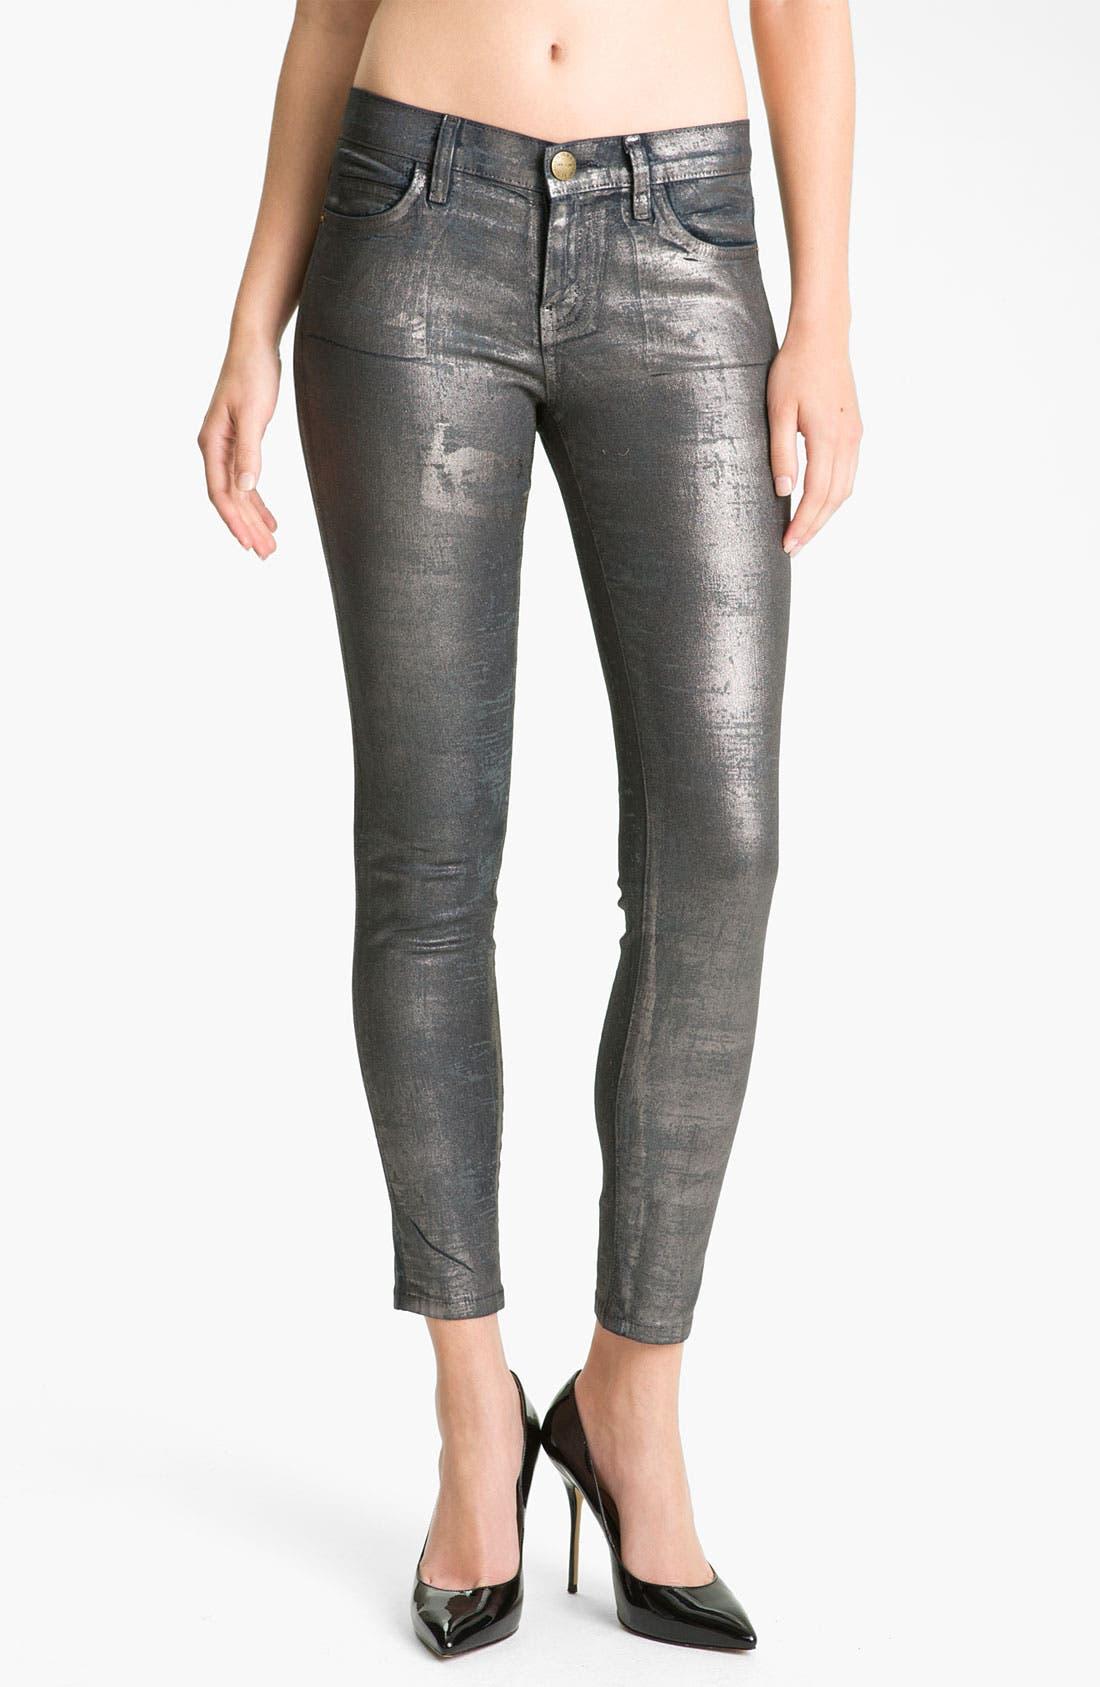 Alternate Image 1 Selected - Current/Elliott Metallic Skinny Jeans (Silver Coated Foil)